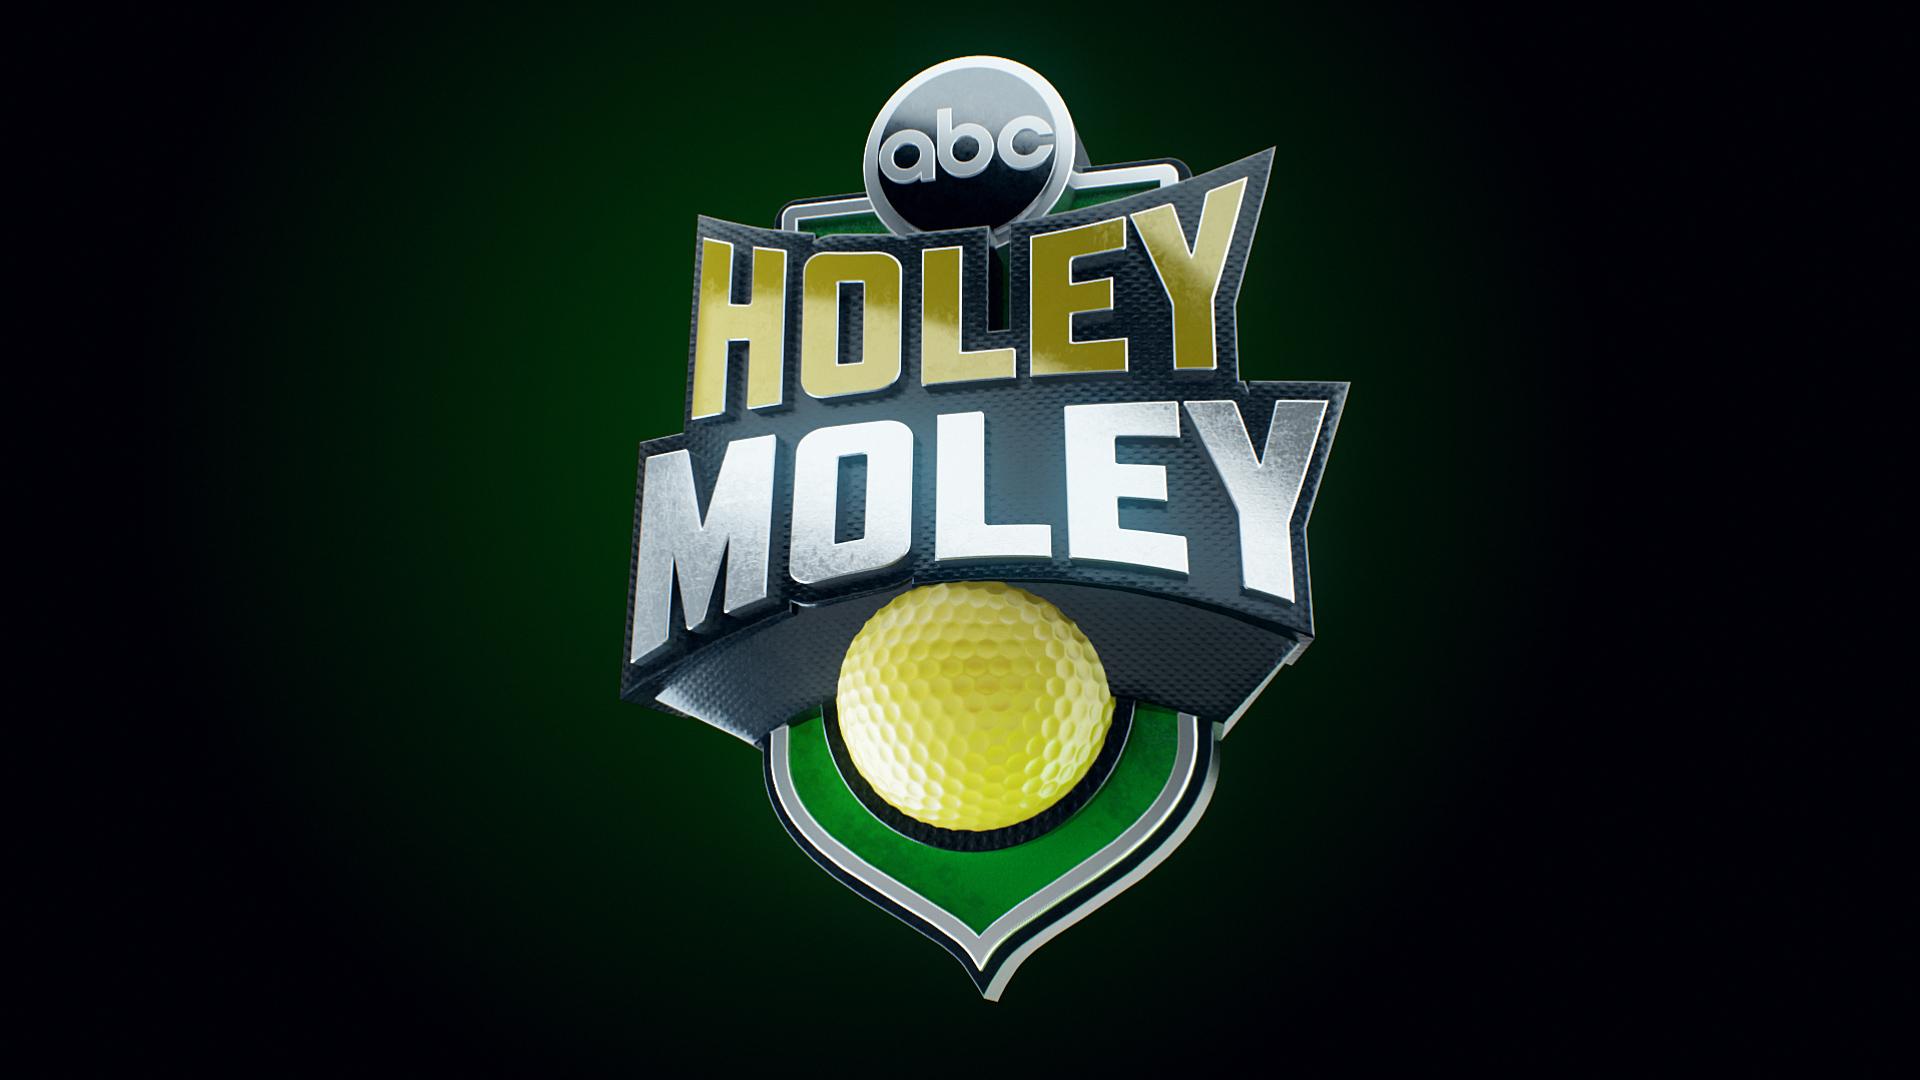 holey2_0001 (00019).jpg